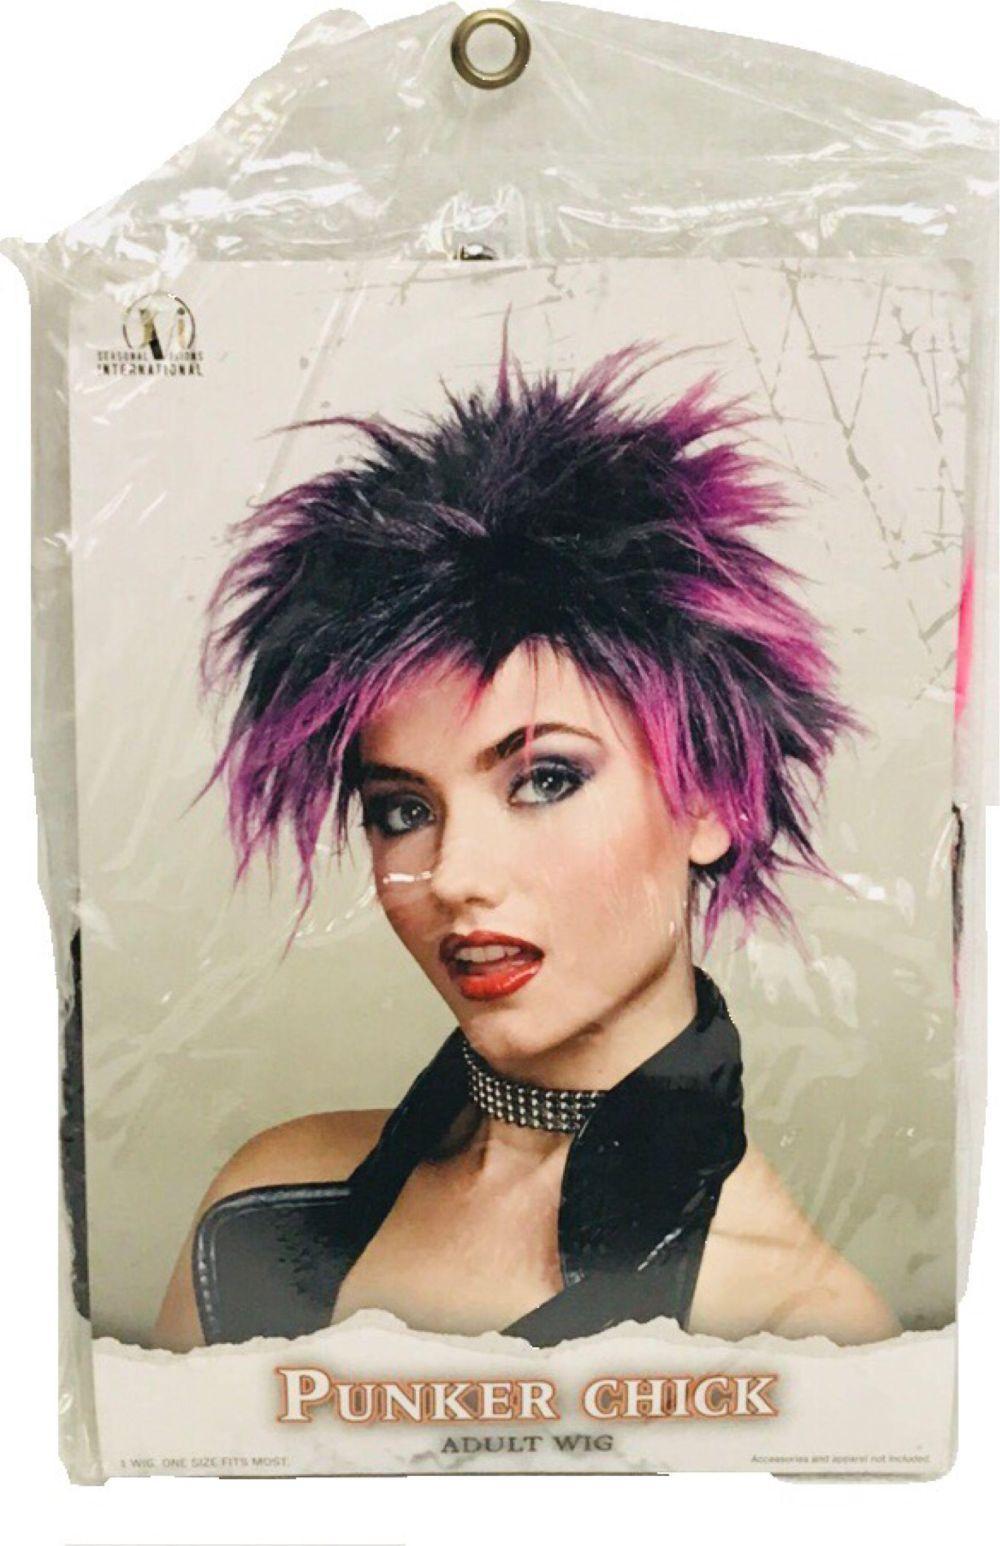 NOS - Halloween Wig - PUNKER CHICK - Adult Size